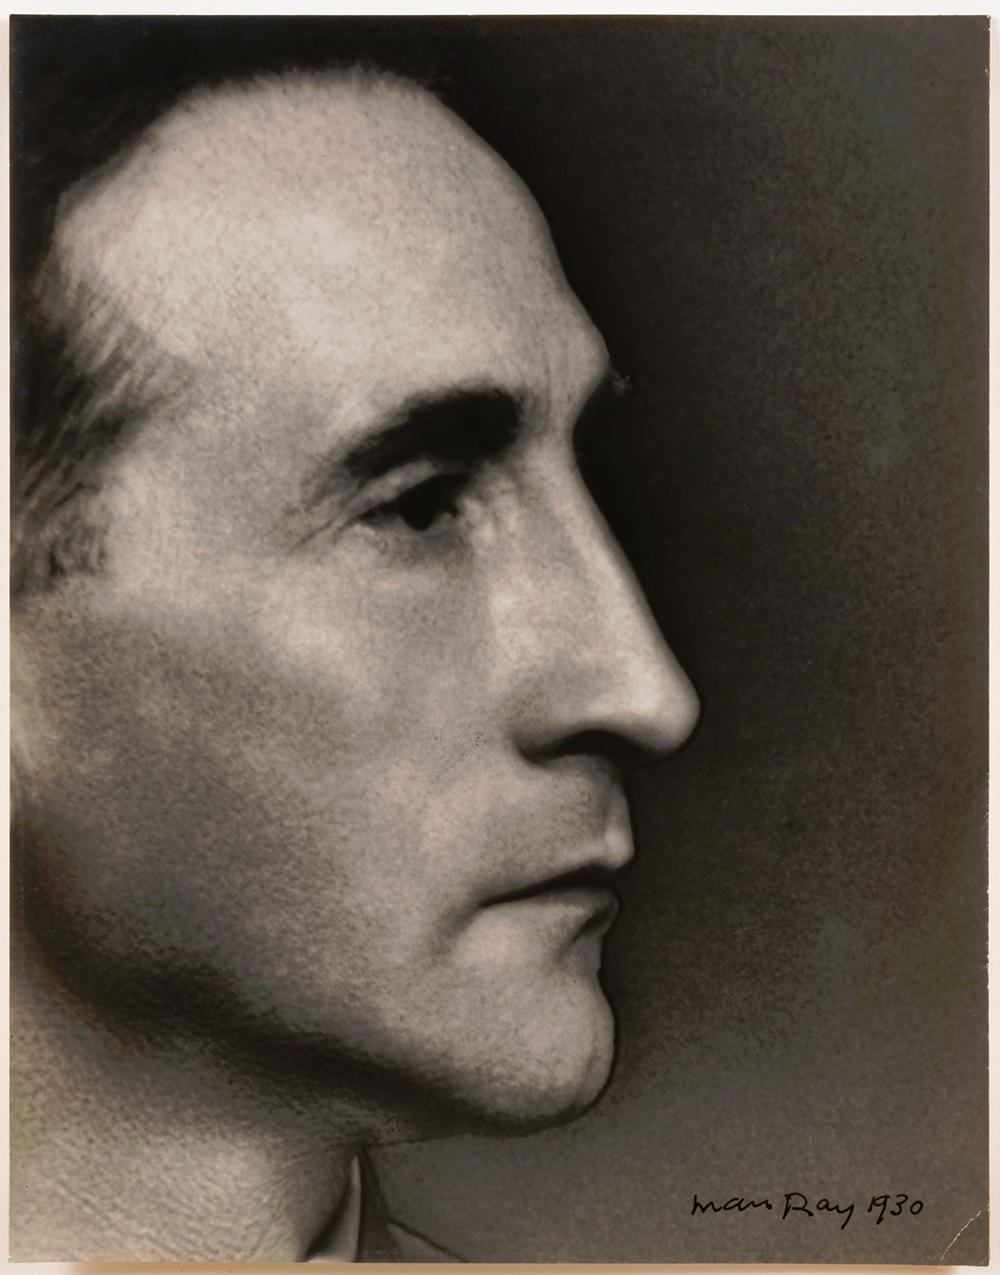 PHOTO: MAN RAY 1930 PORTRAIT: MARCHEL DUCHAMP